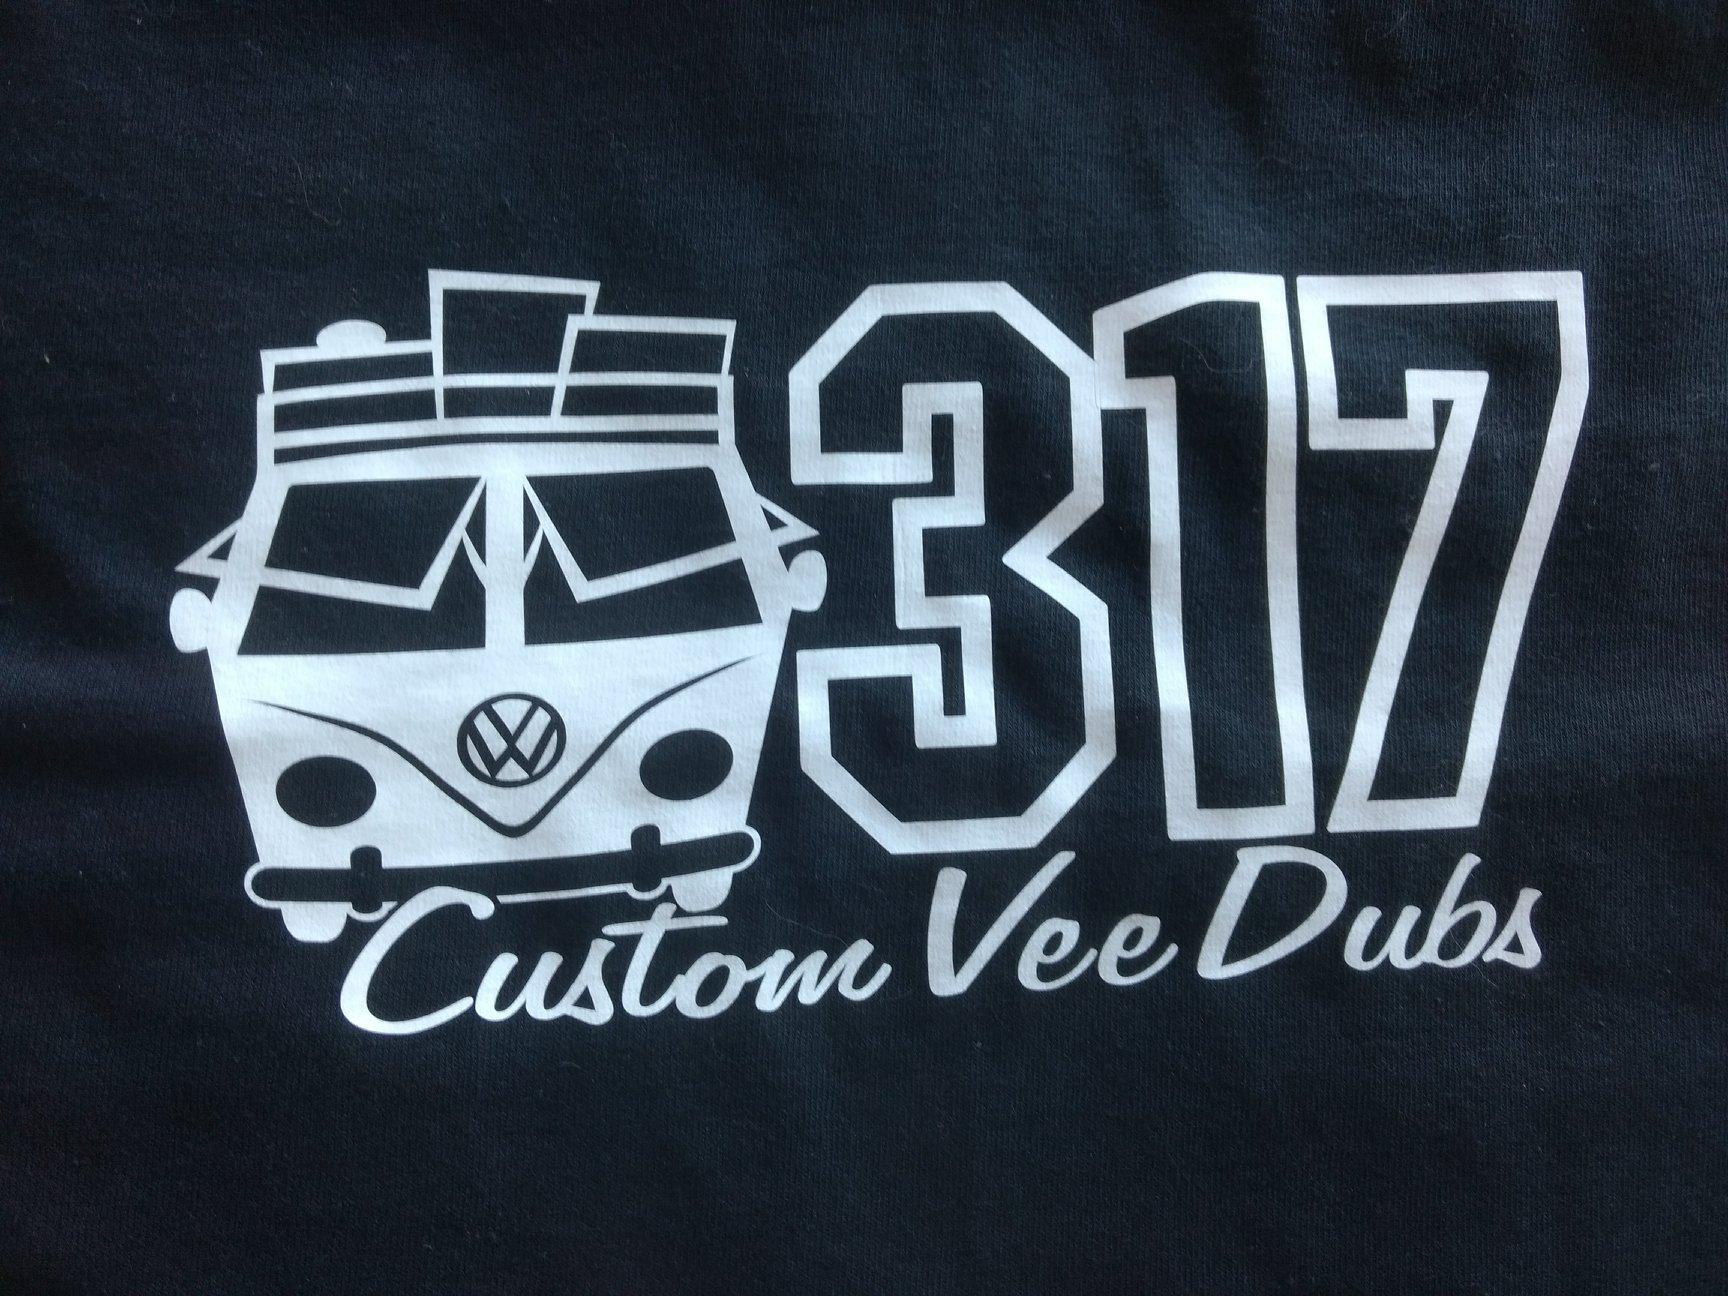 317 Custom Vee Dubs